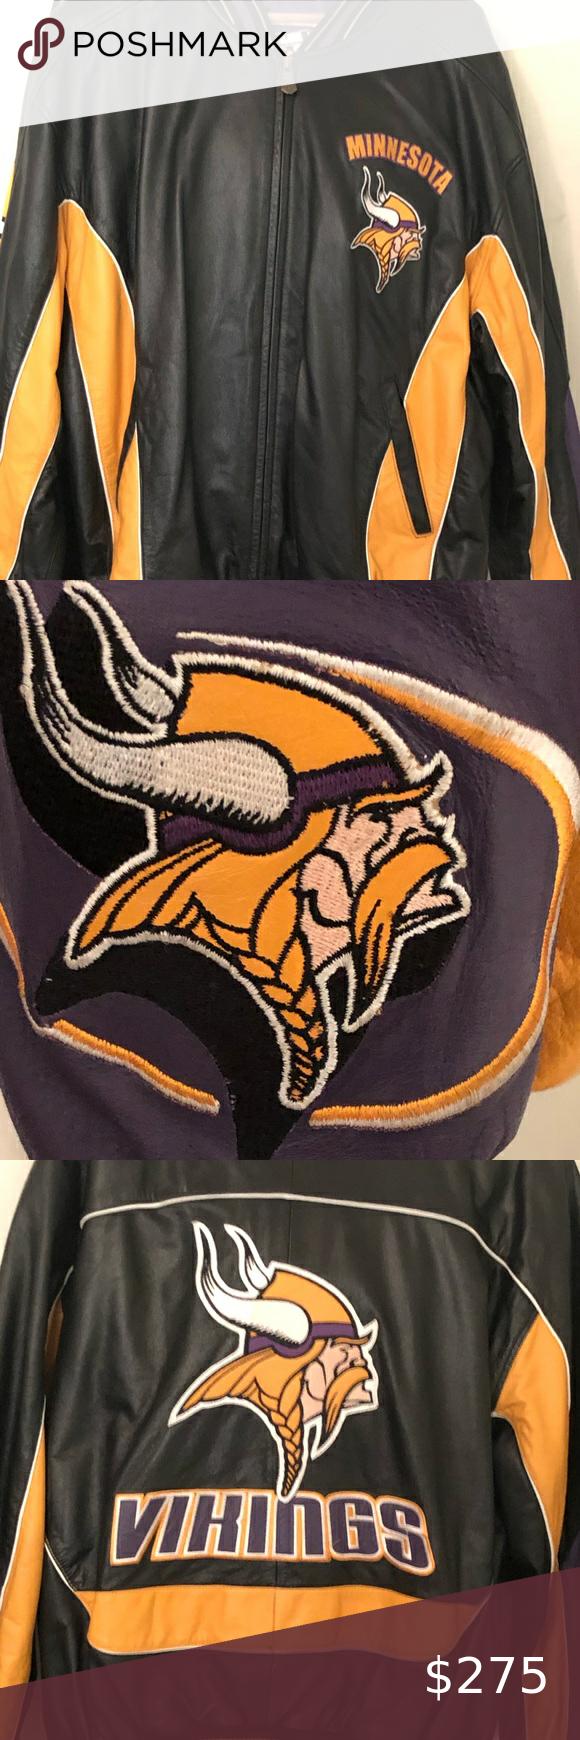 Minnesota Viking Nfl Leather Jacket Leather Jacket Quarter Zip Pullover Running Jacket [ 1740 x 580 Pixel ]